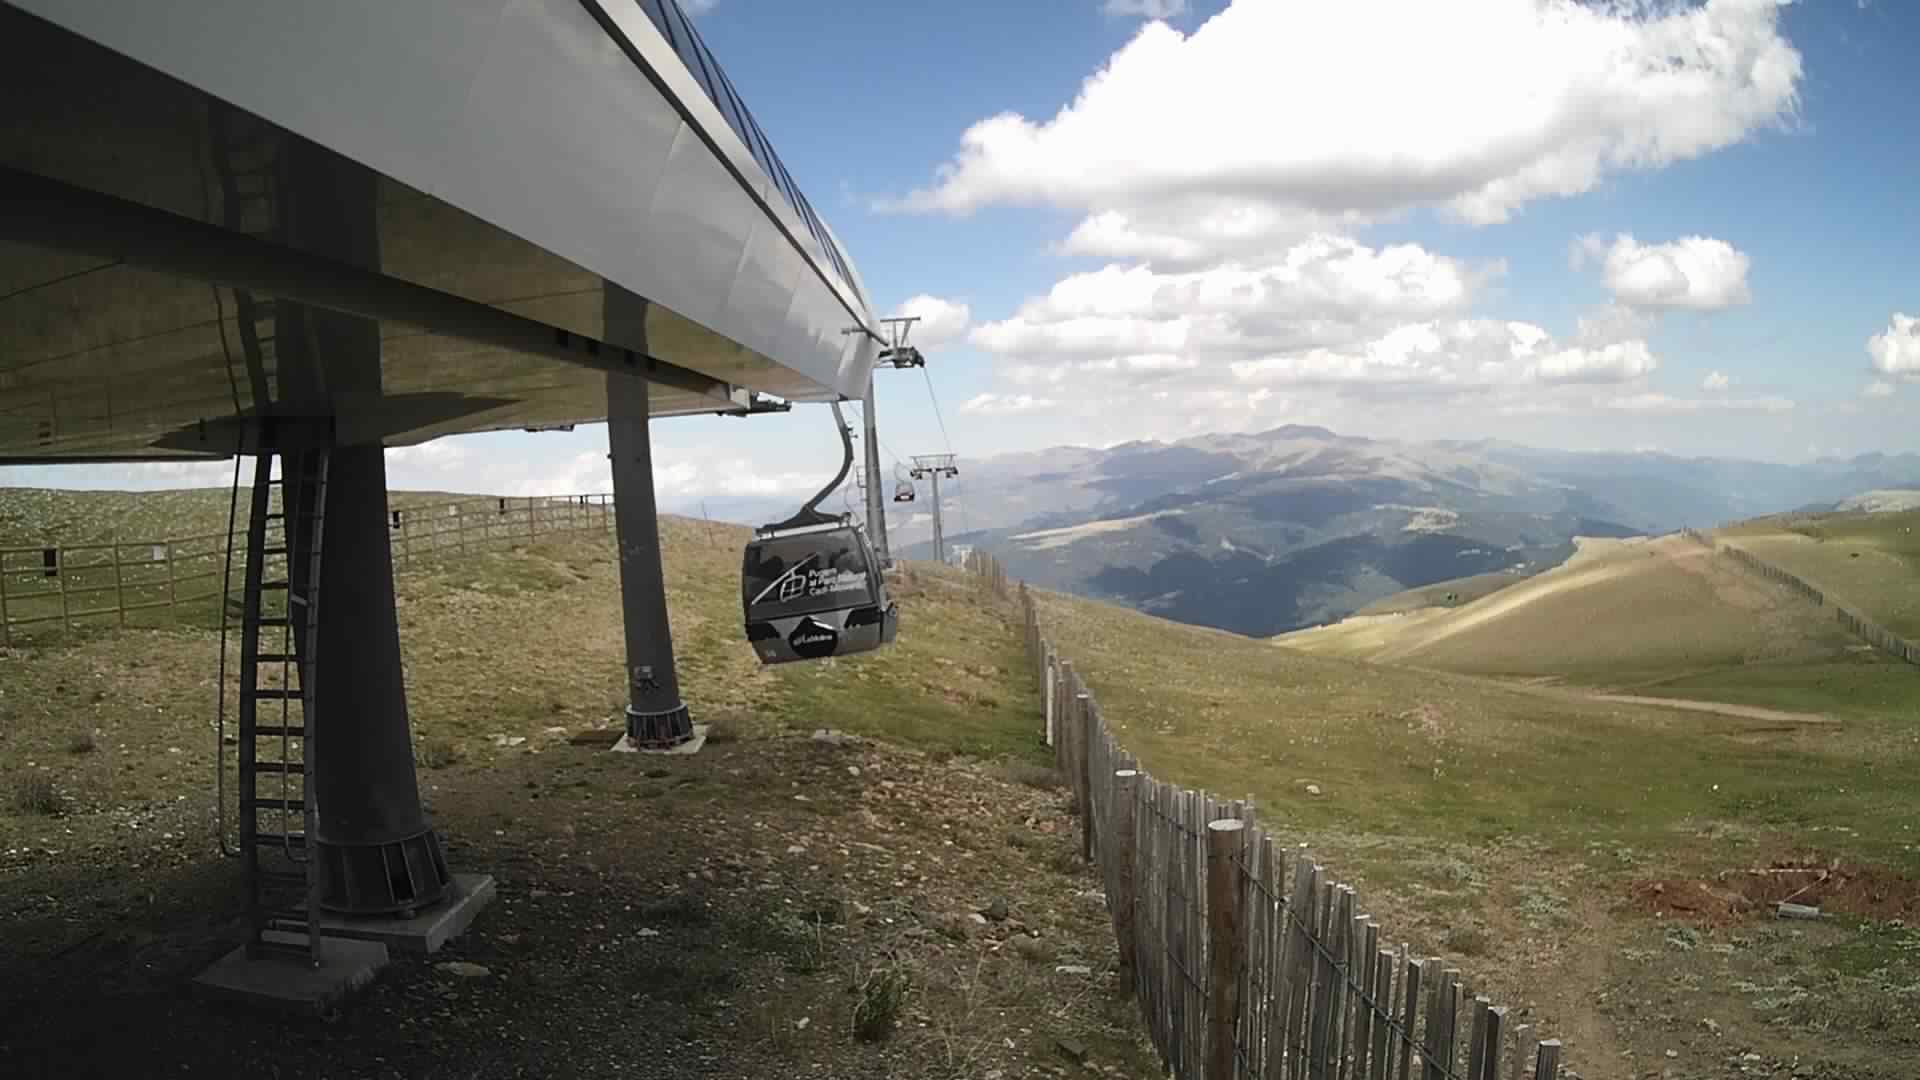 Webcam en TC Cadí-Moixeró - Superior